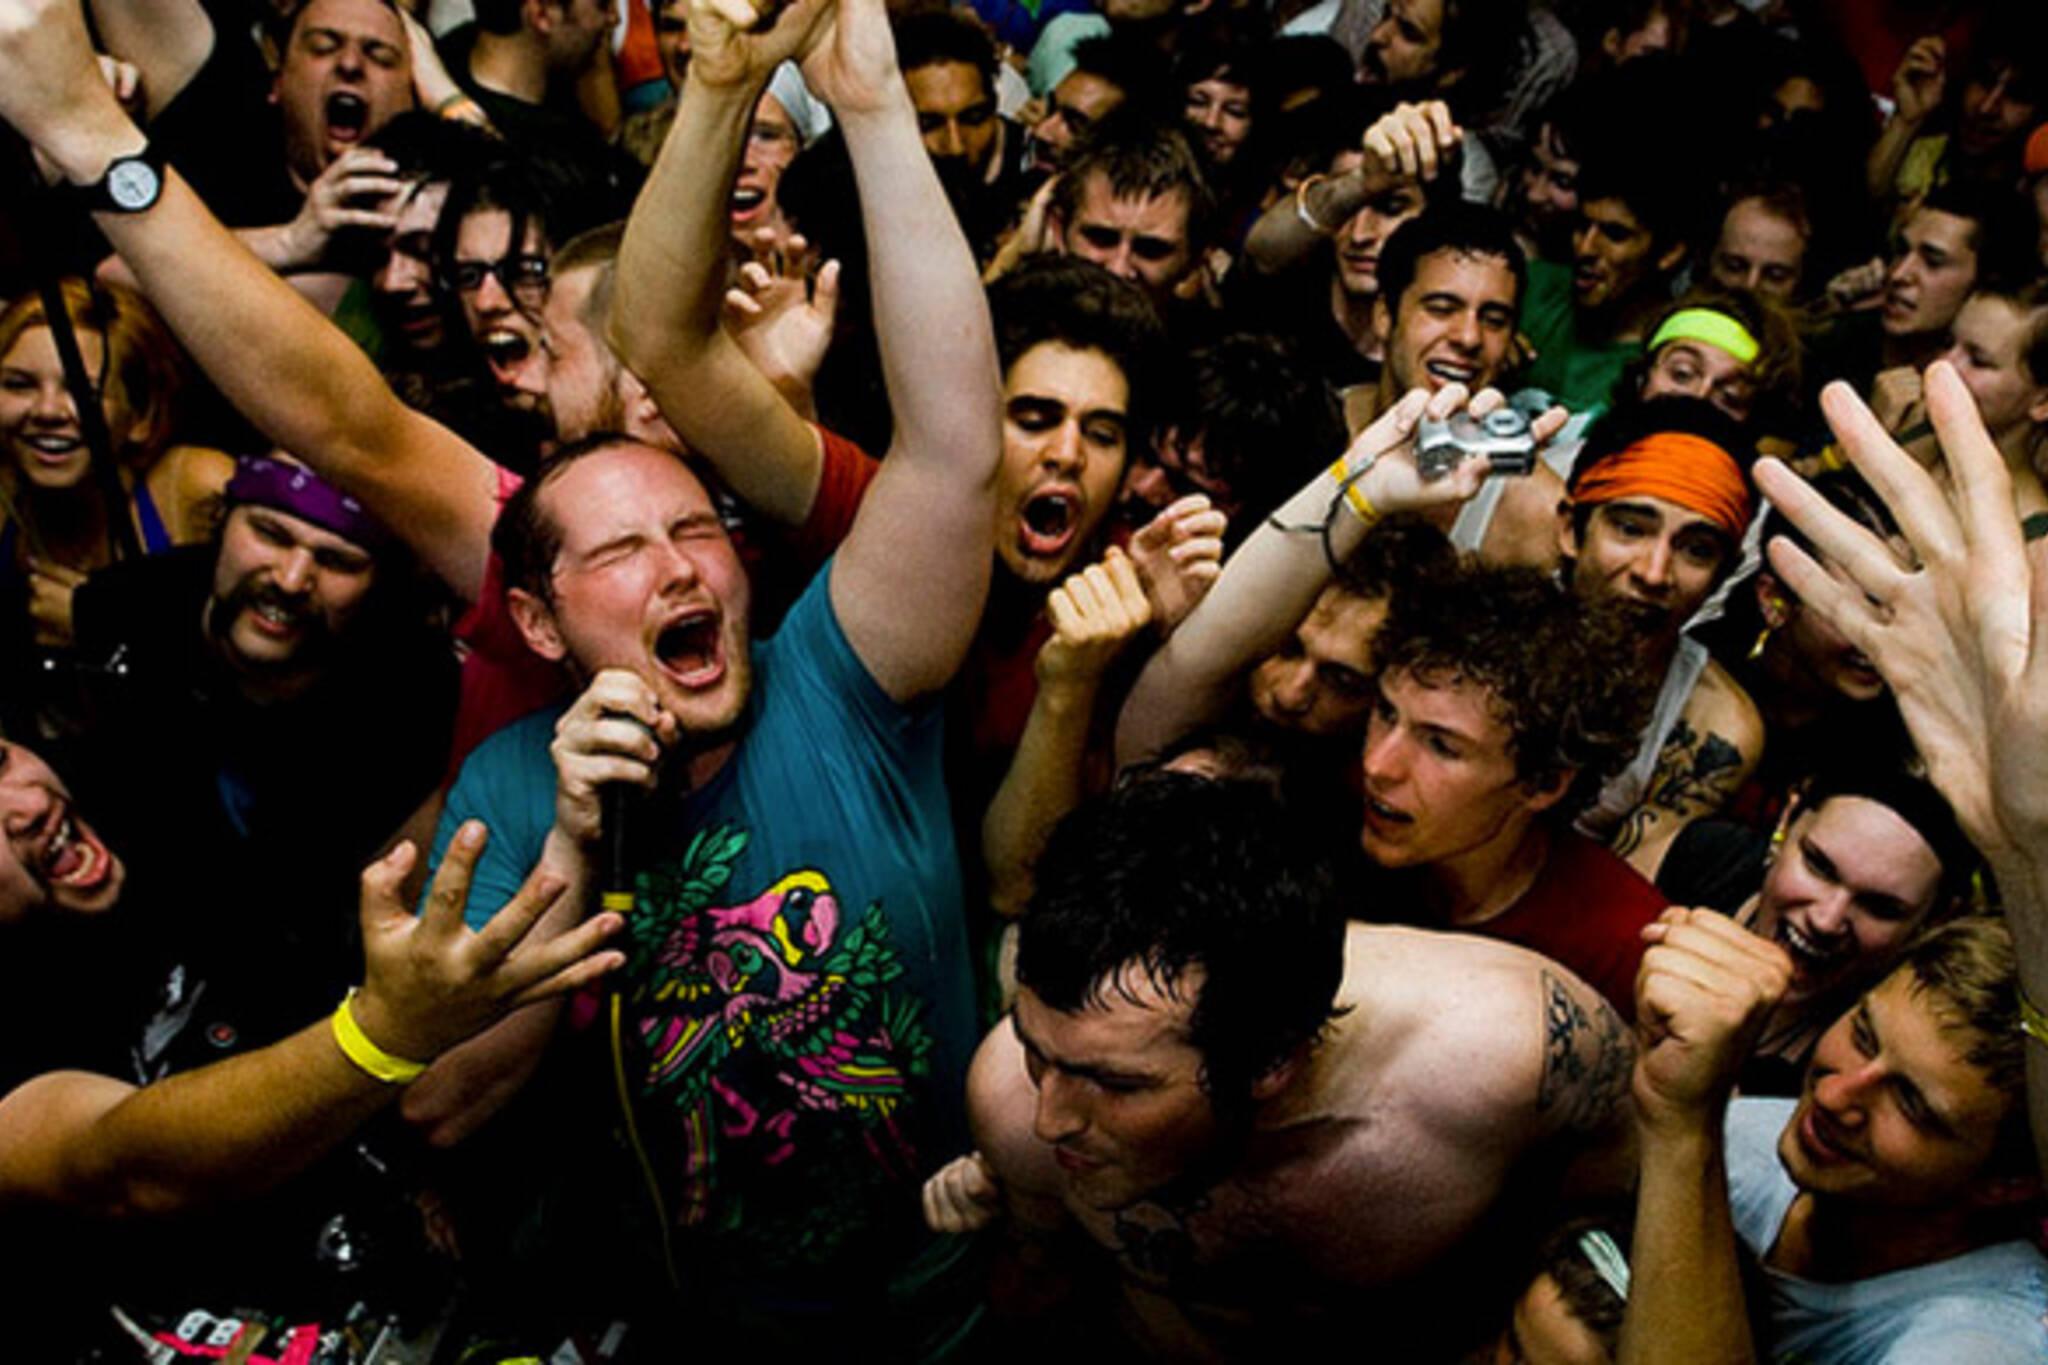 Toronto Concerts November 2012